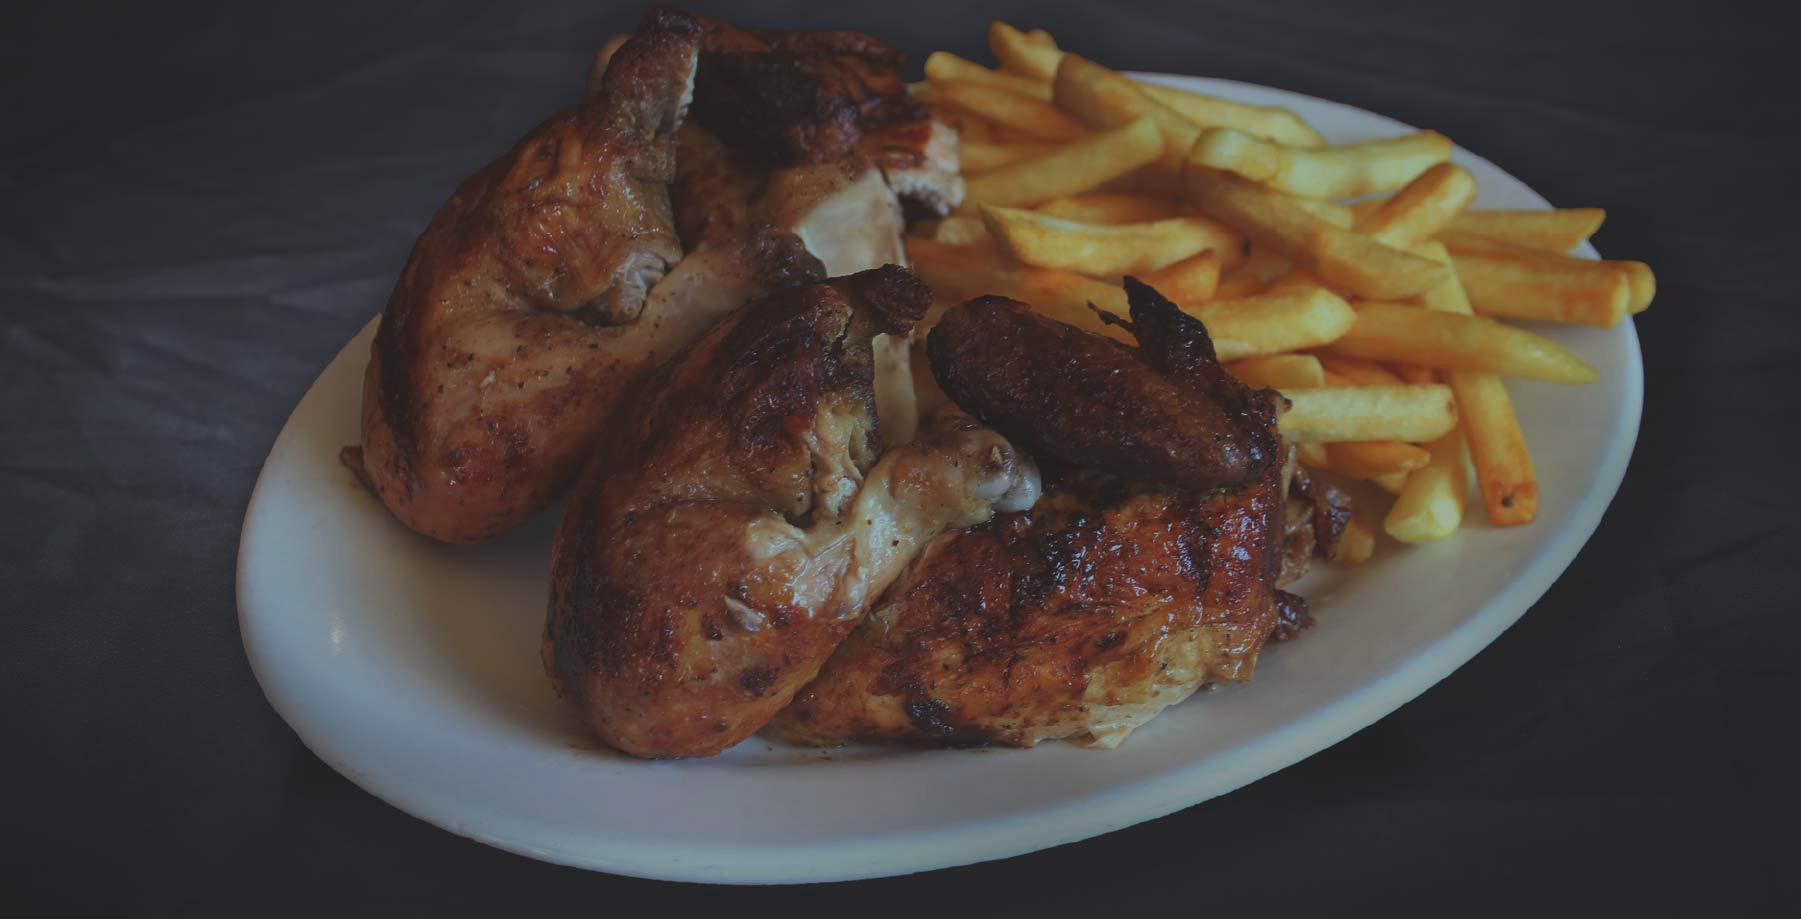 El Pollo Inka Peruvian rotisserie chicken and French Fries